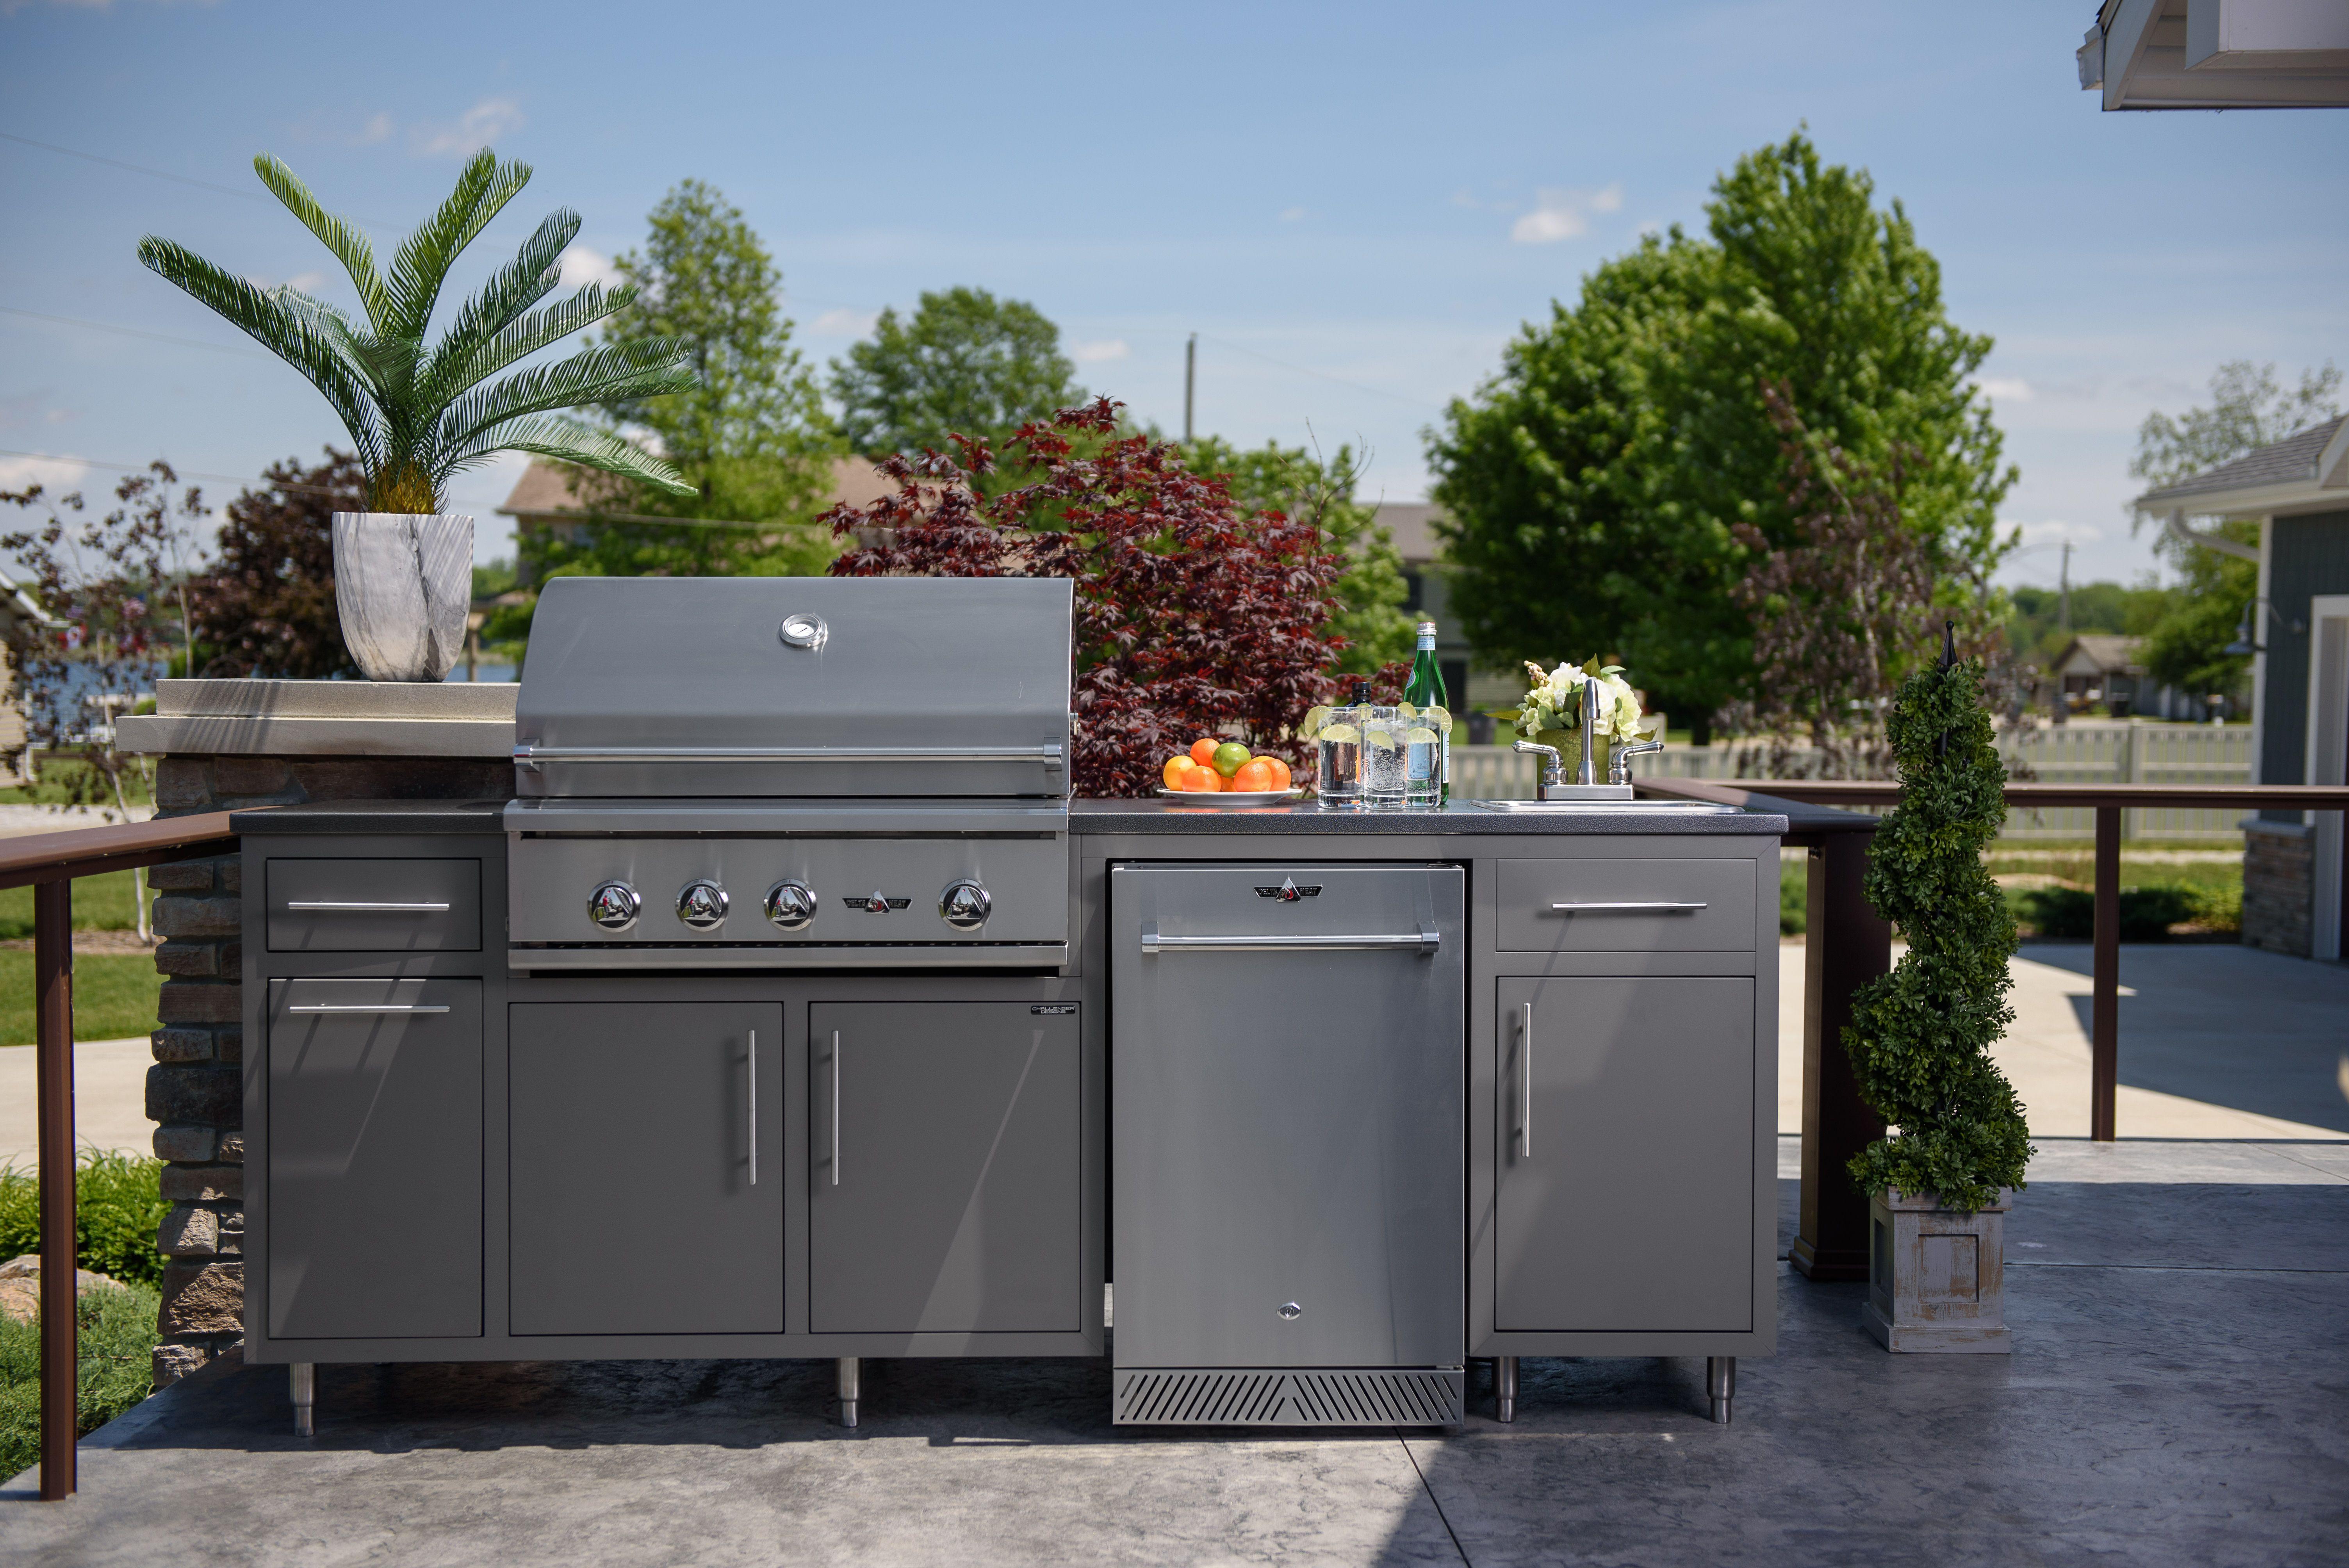 Outdoor Rooftop Kitchen In 2020 Outdoor Kitchen Cabinets Outdoor Kitchen House Designs Exterior